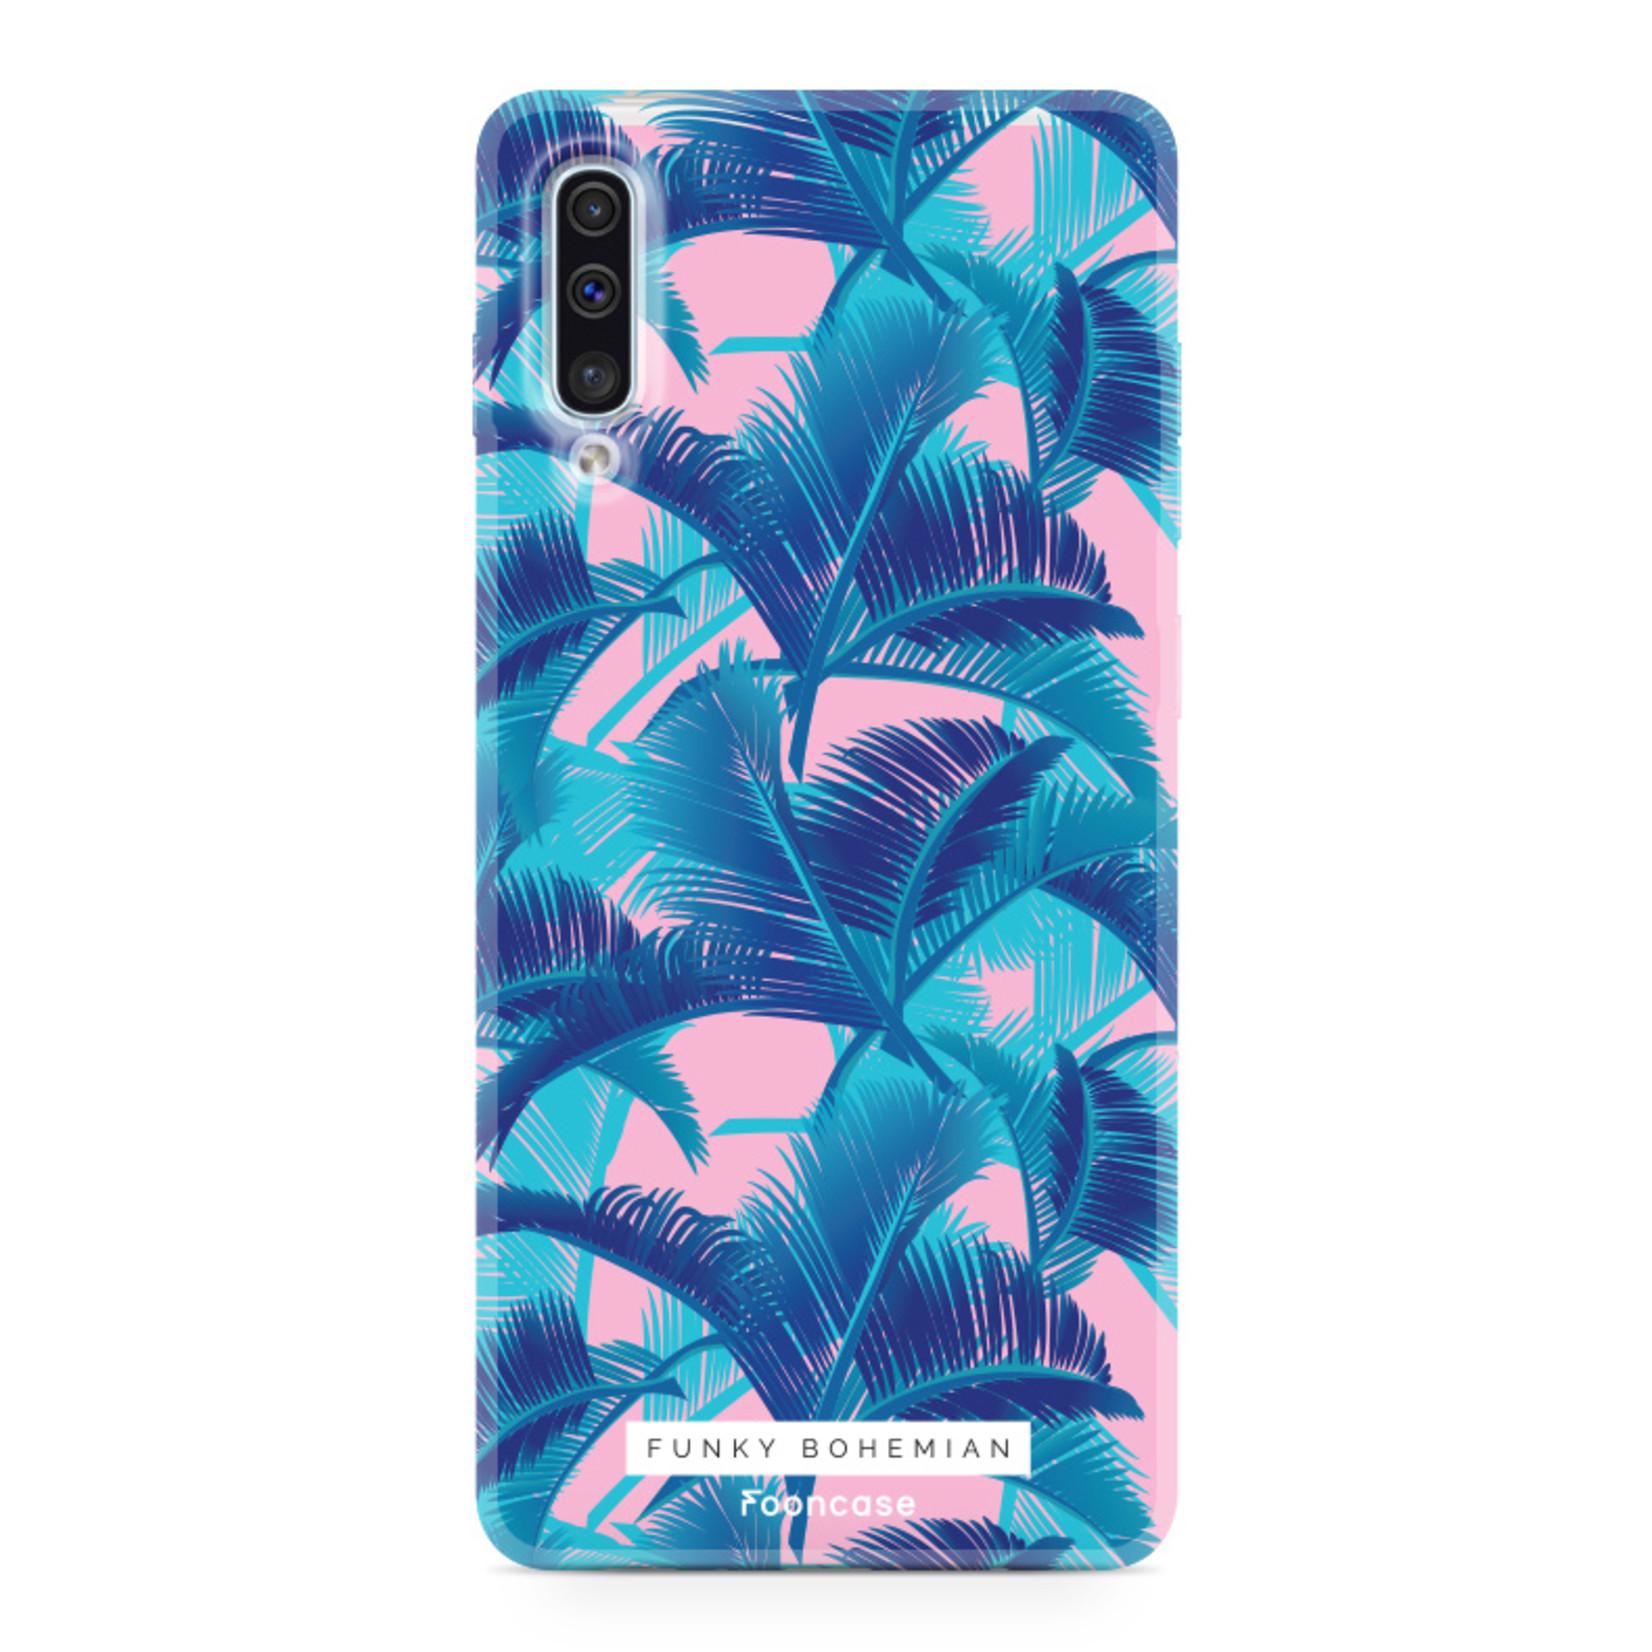 FOONCASE Samsung Galaxy A50 hoesje TPU Soft Case - Back Cover - Funky Bohemian / Blauw Roze Bladeren